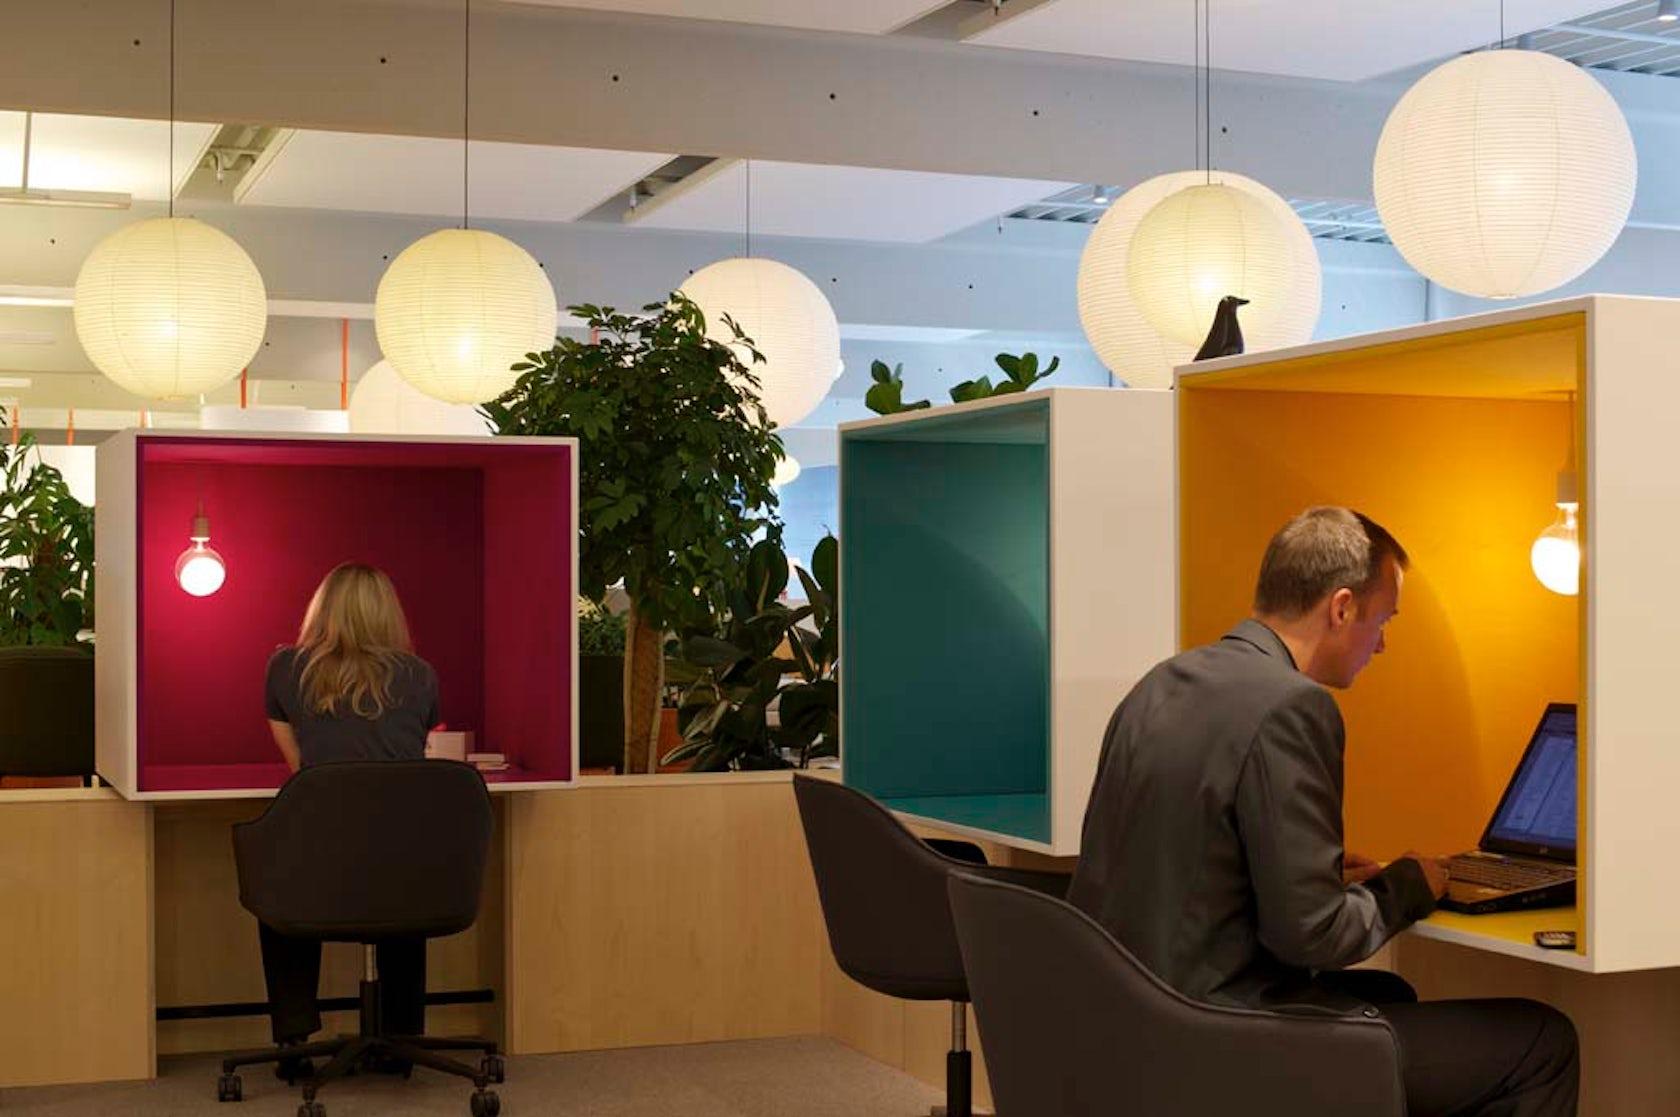 Vitra citizen office architizer for Office design vitra